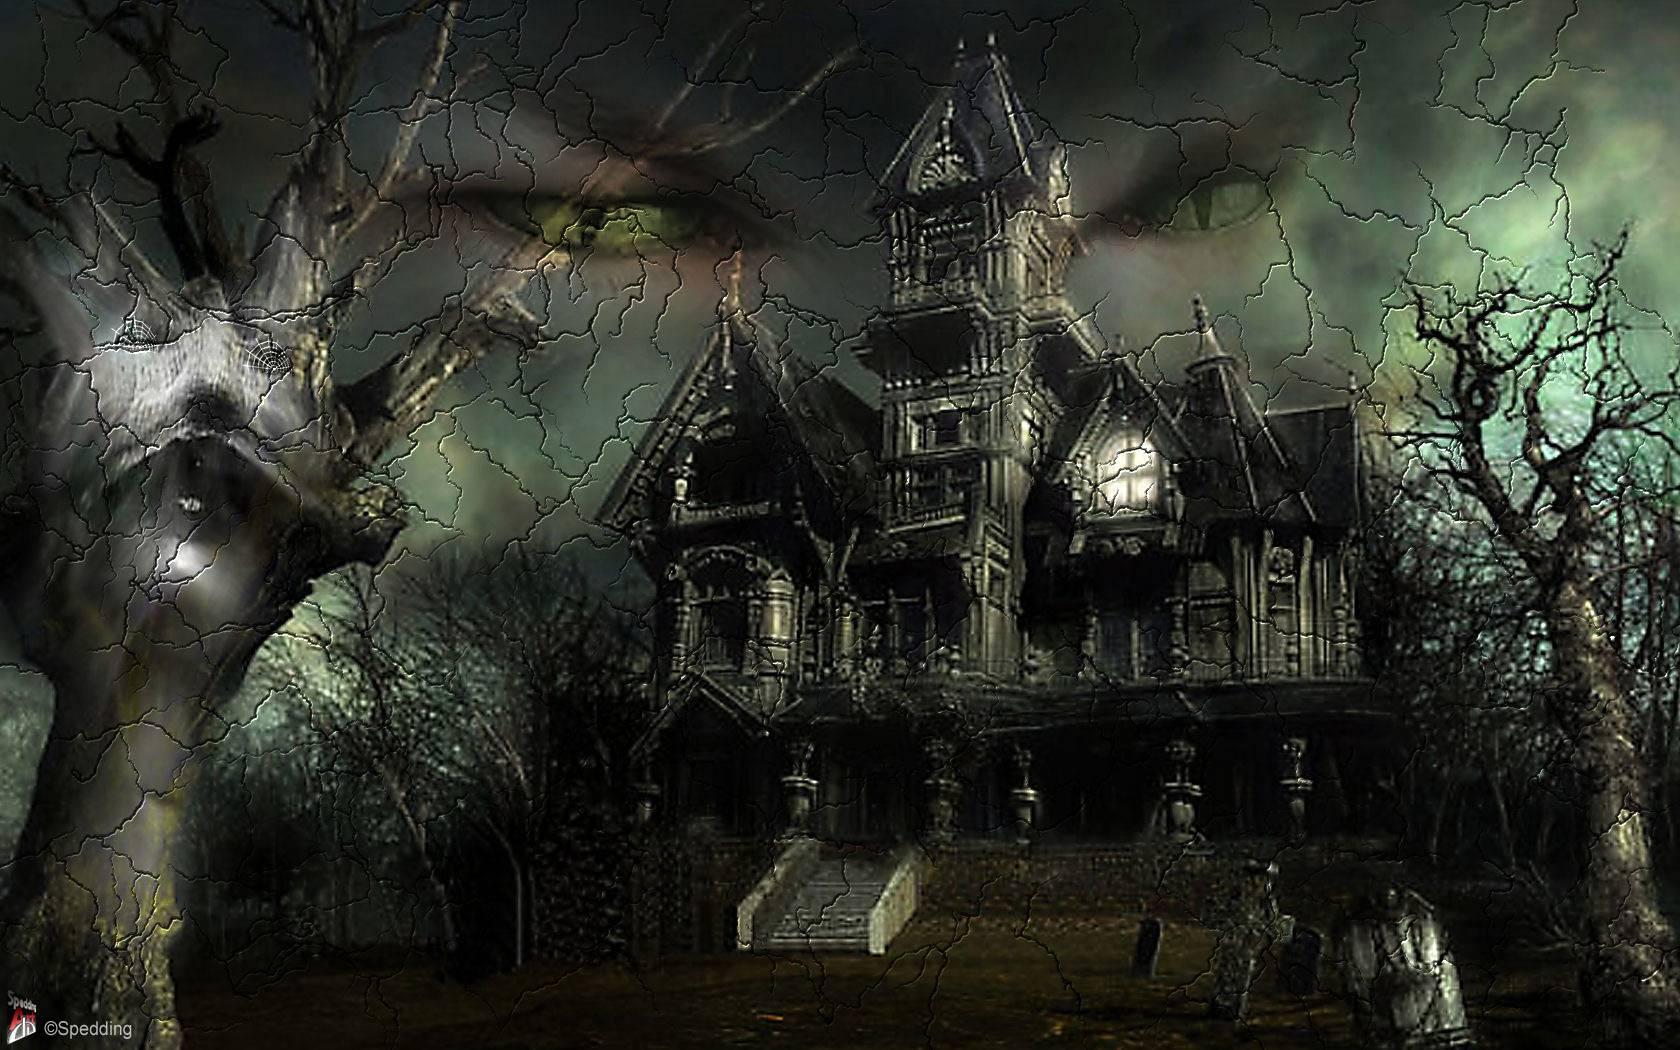 Halloween day desktop wallpaper   SF Wallpaper 1680x1050